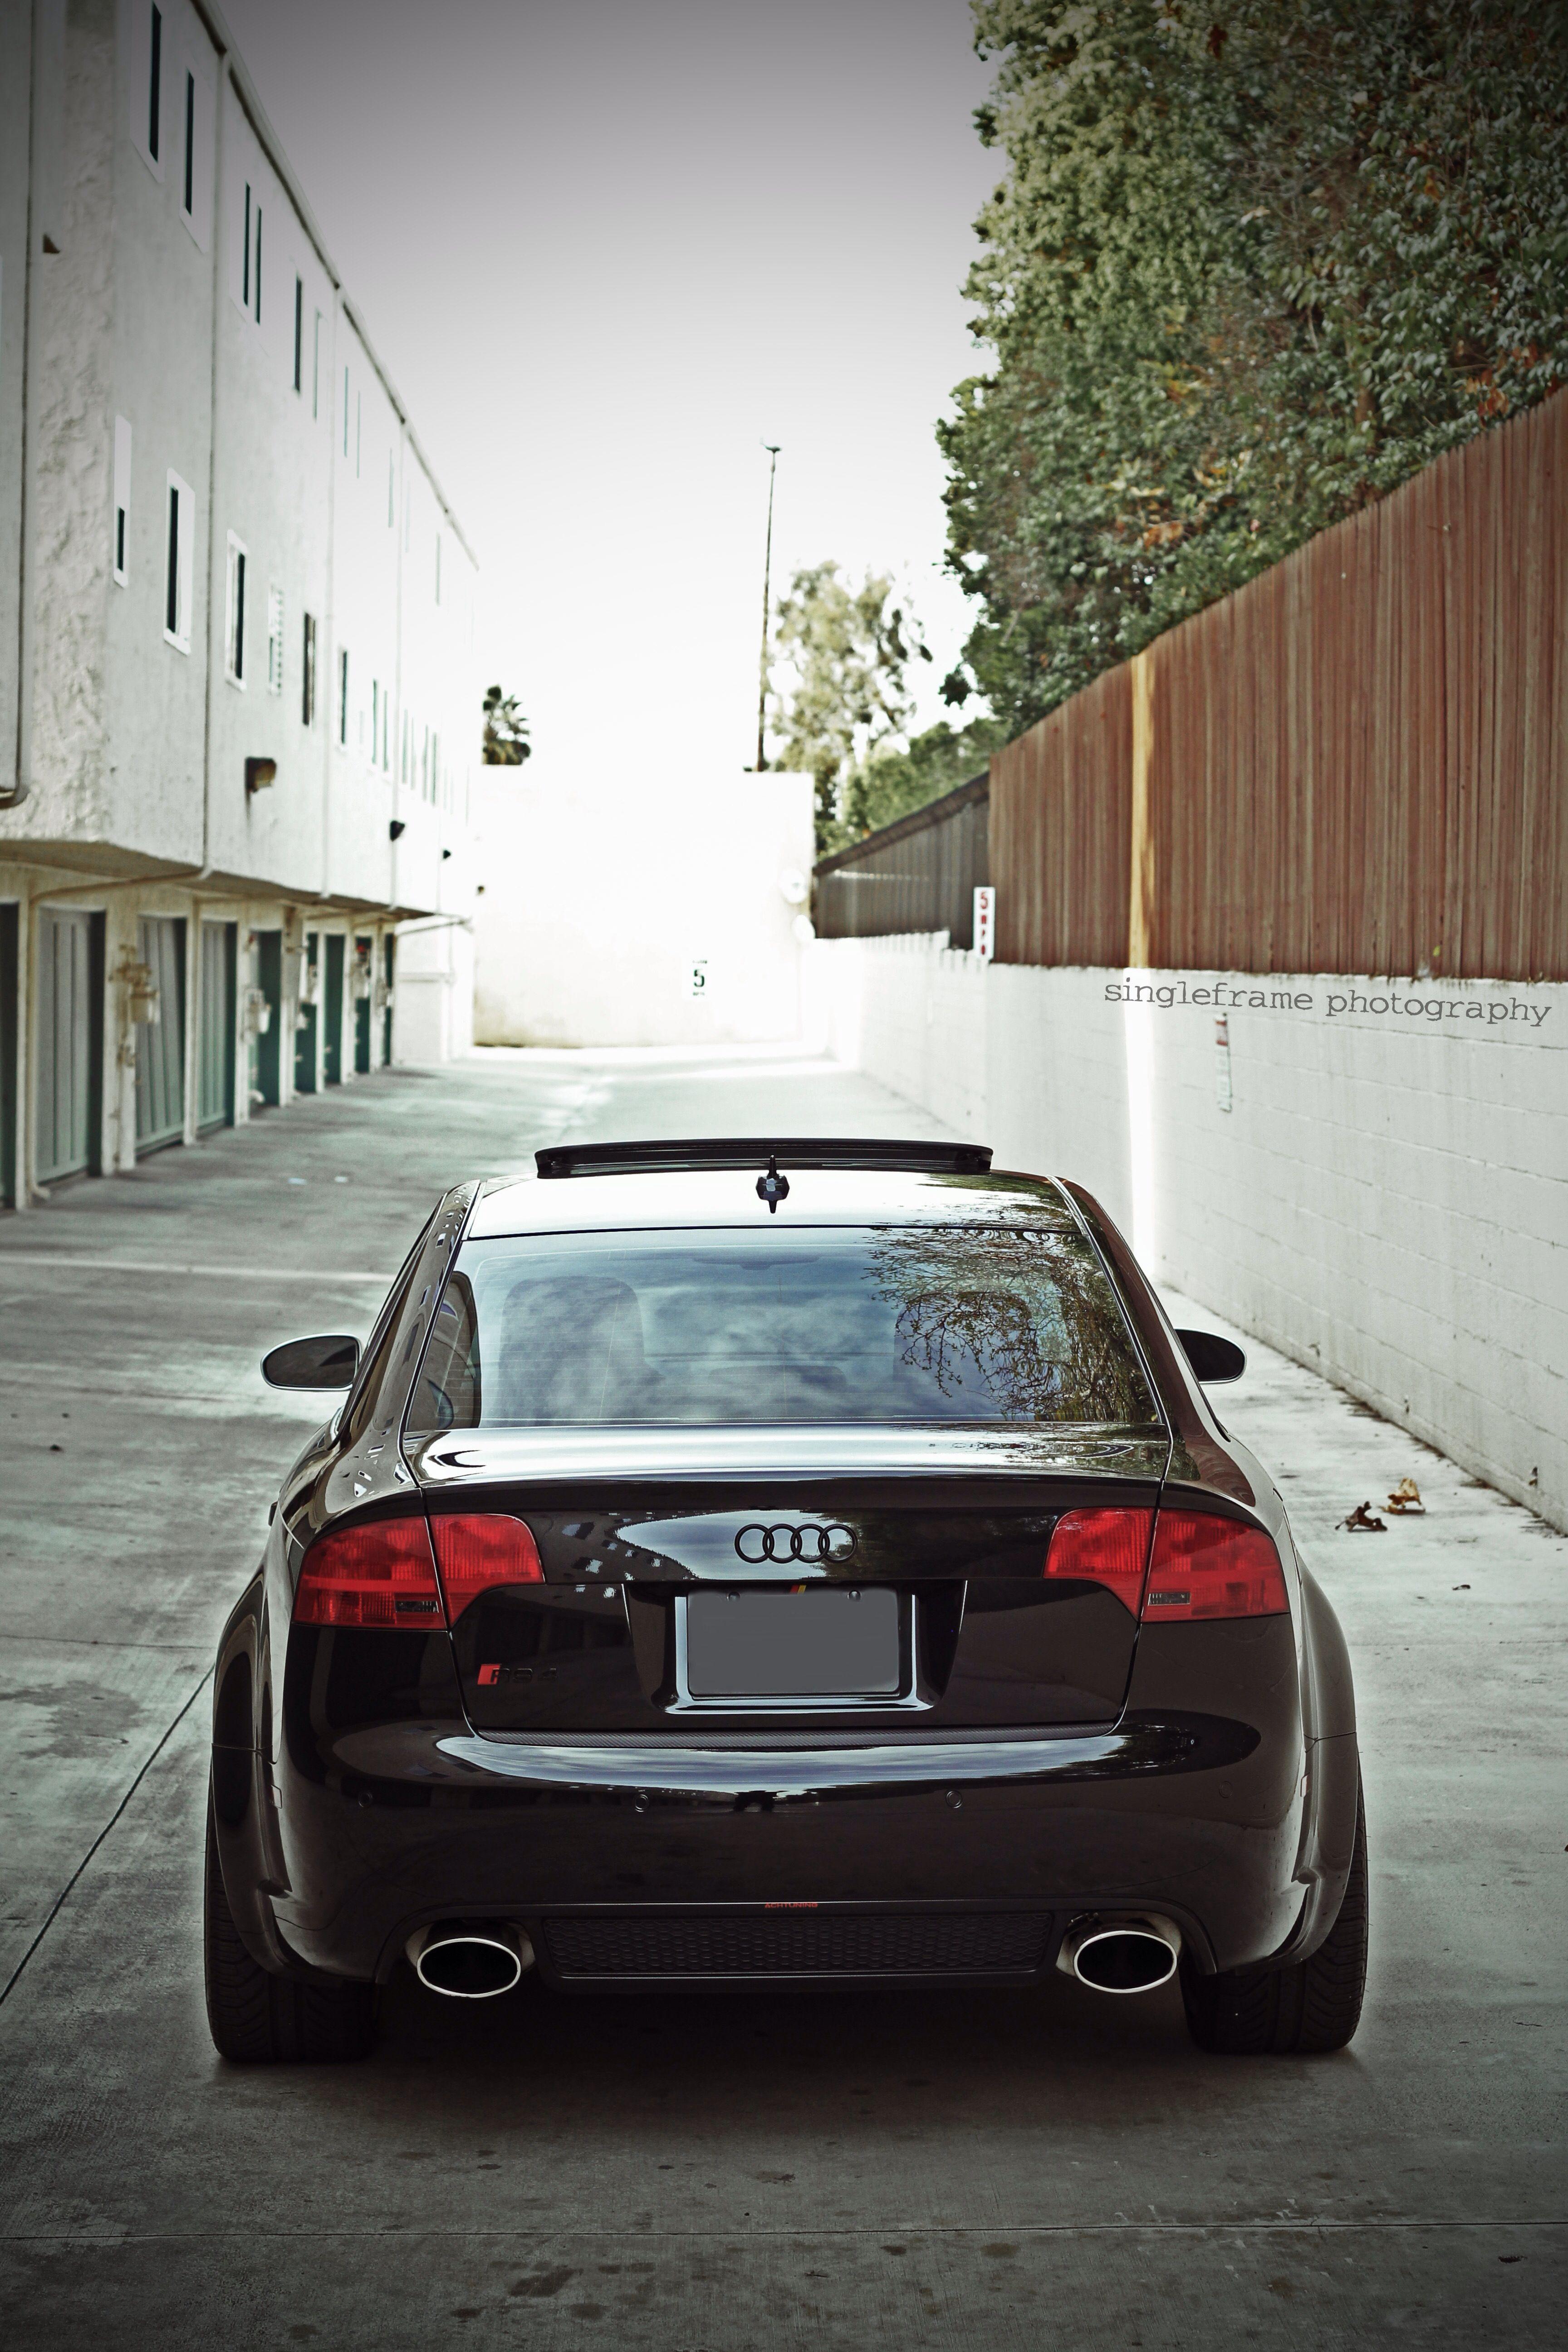 Kelebihan Kekurangan Audi Rs4 2007 Murah Berkualitas